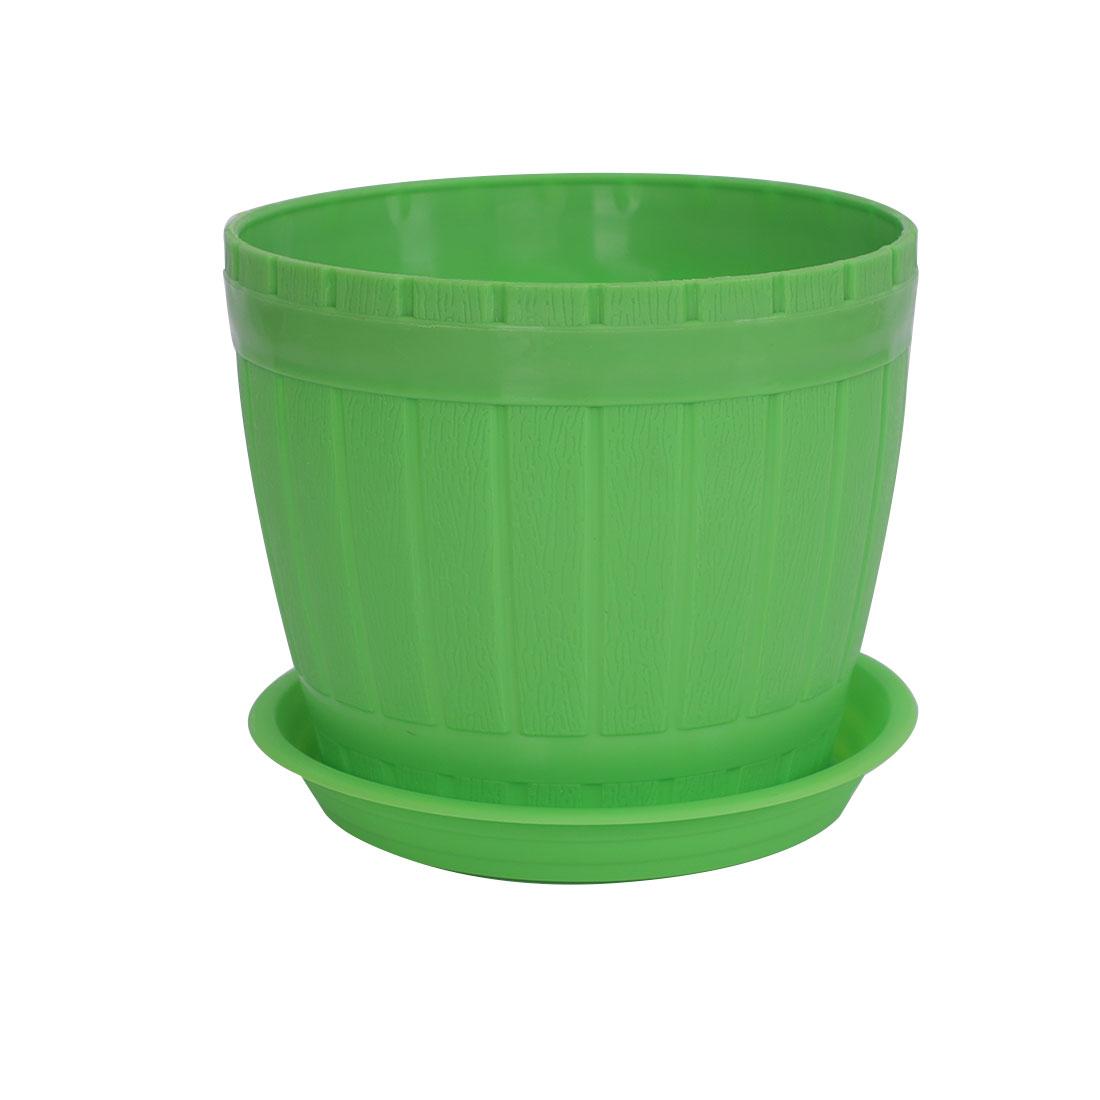 Home Windowsill Hotel Plastic Barrel Shape Plant Flower Pot Planter Green w Tray